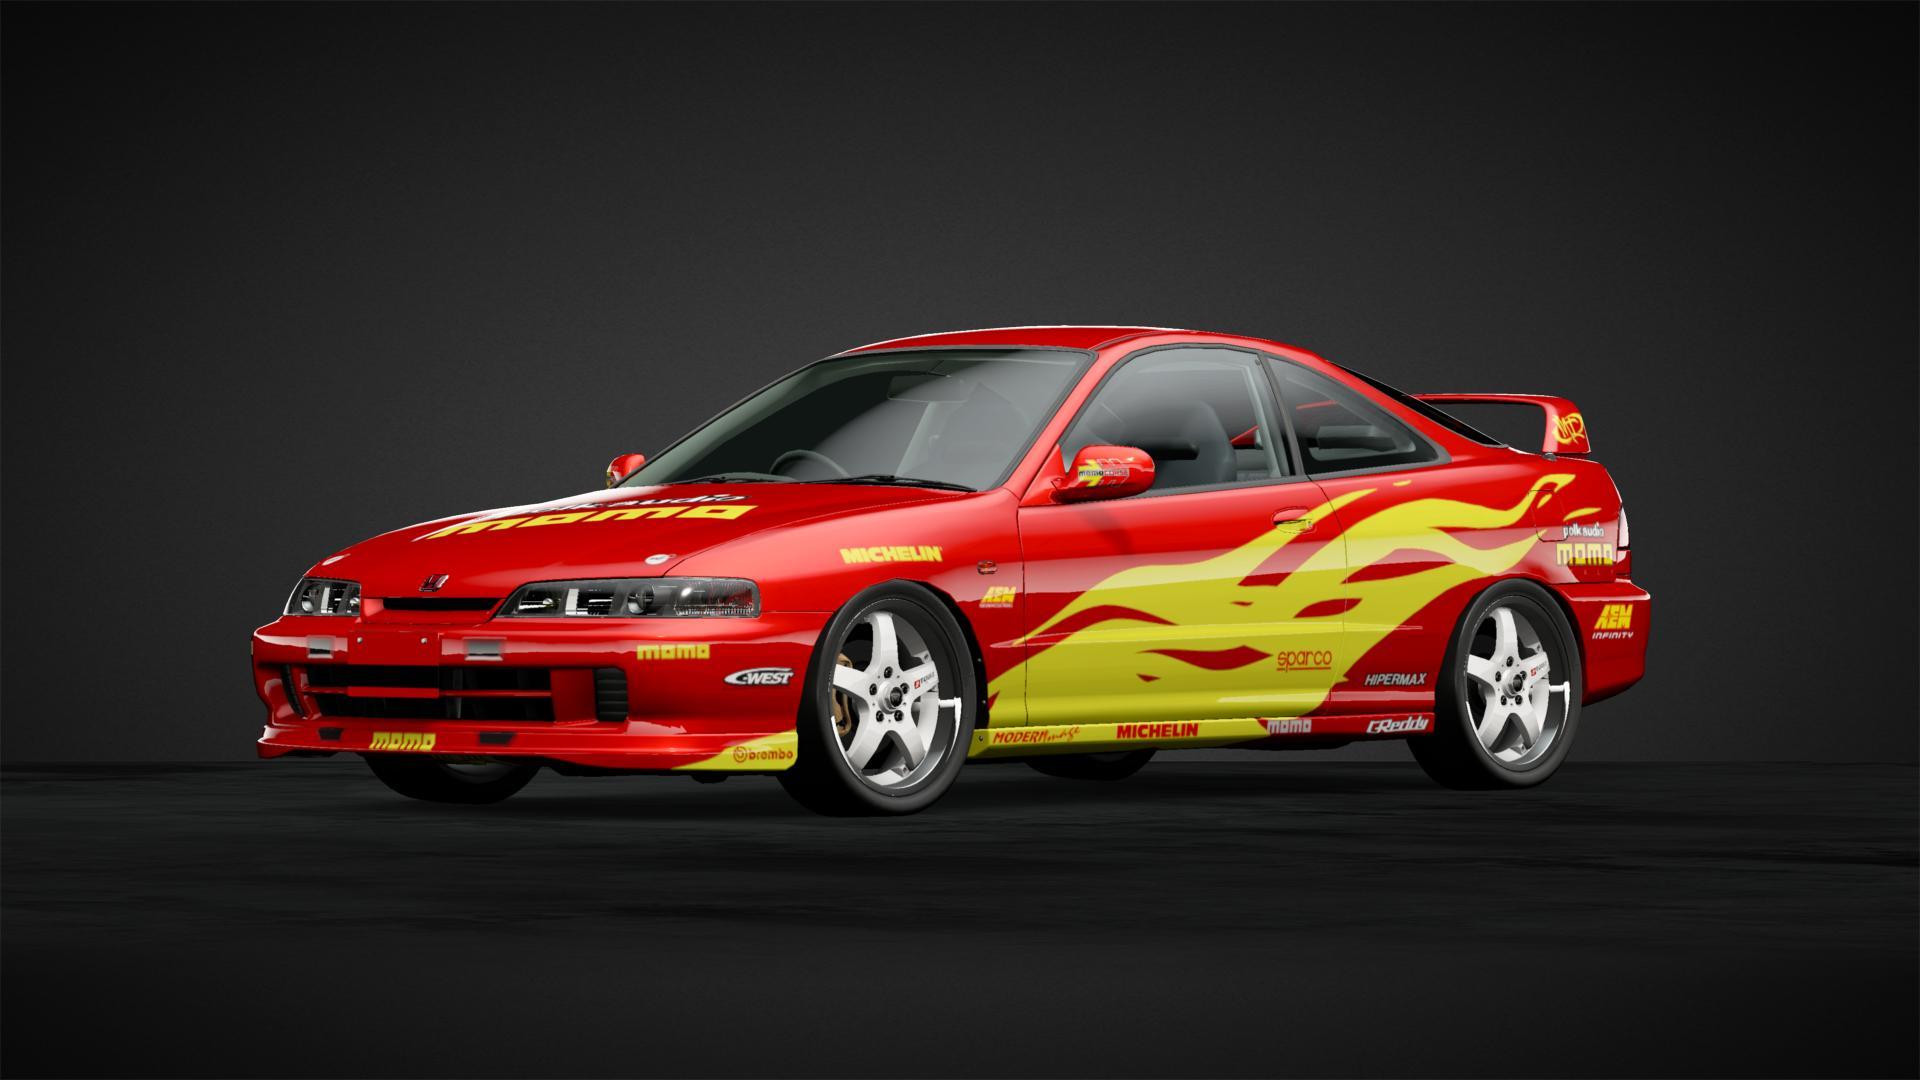 Acura Integra R Fast Furious Car Livery By Johnnyb7531 Community Gran Turismo Sport